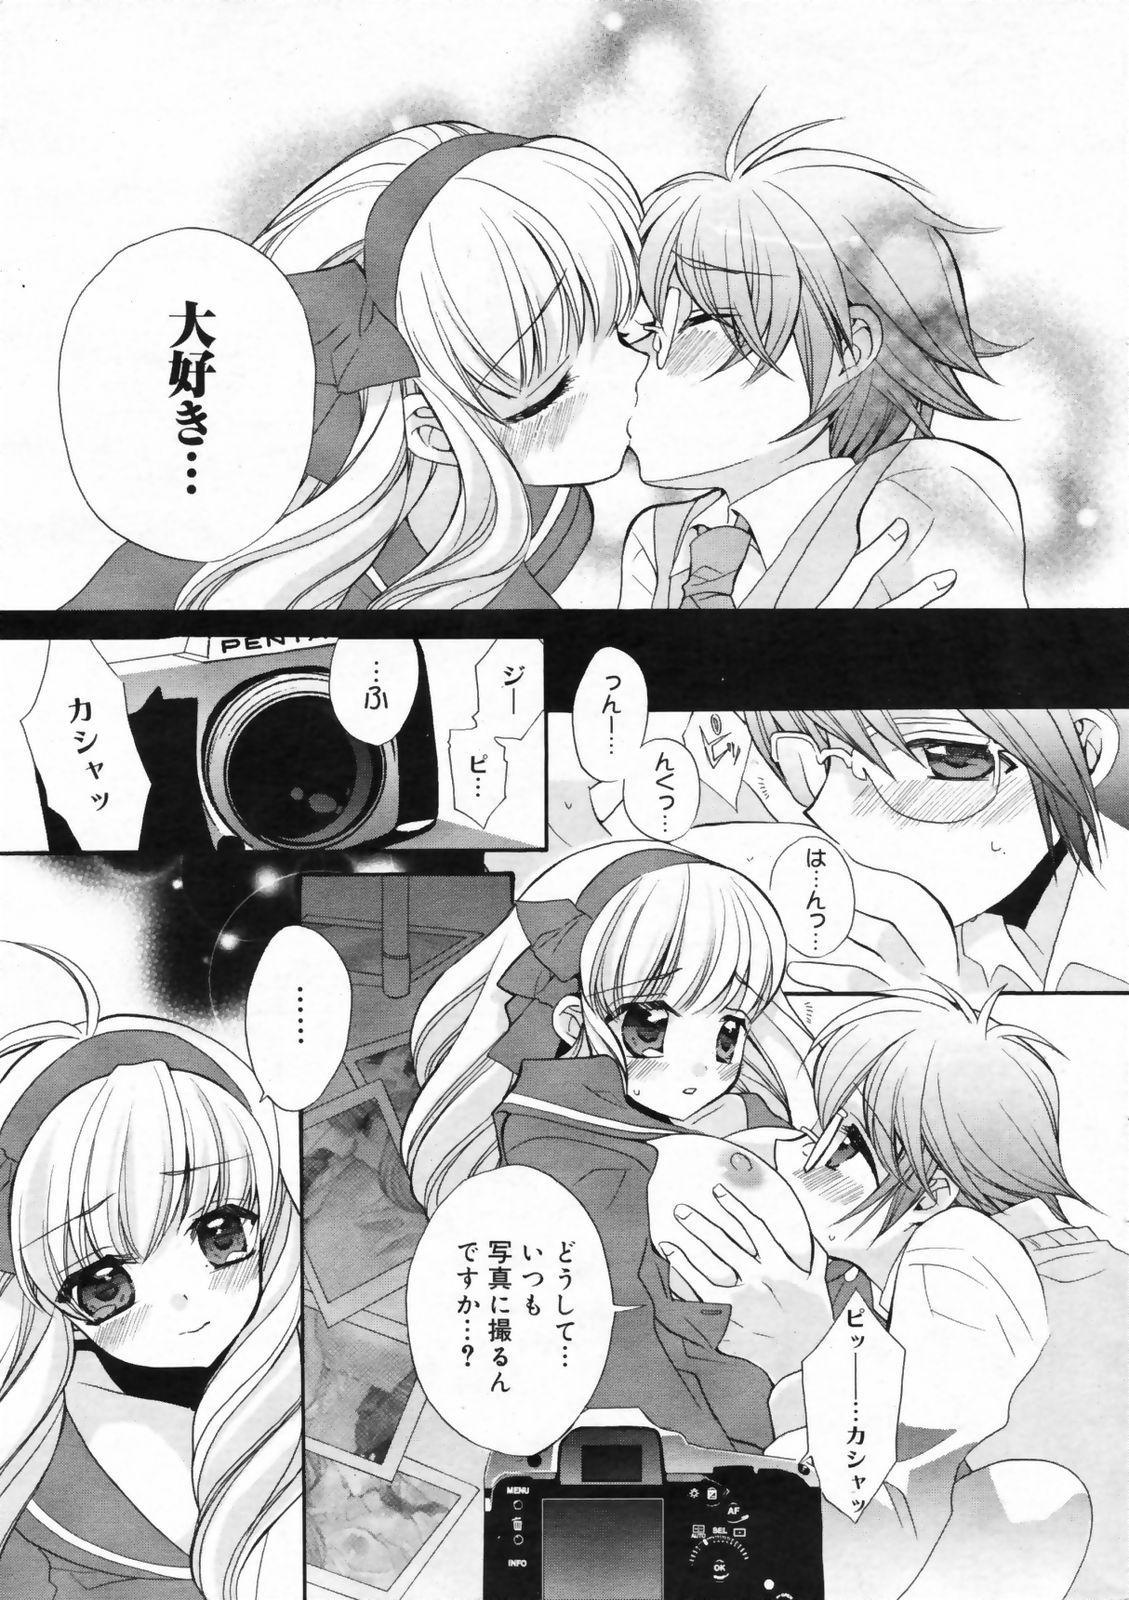 Manga Bangaichi 2009-02 Vol. 234 14